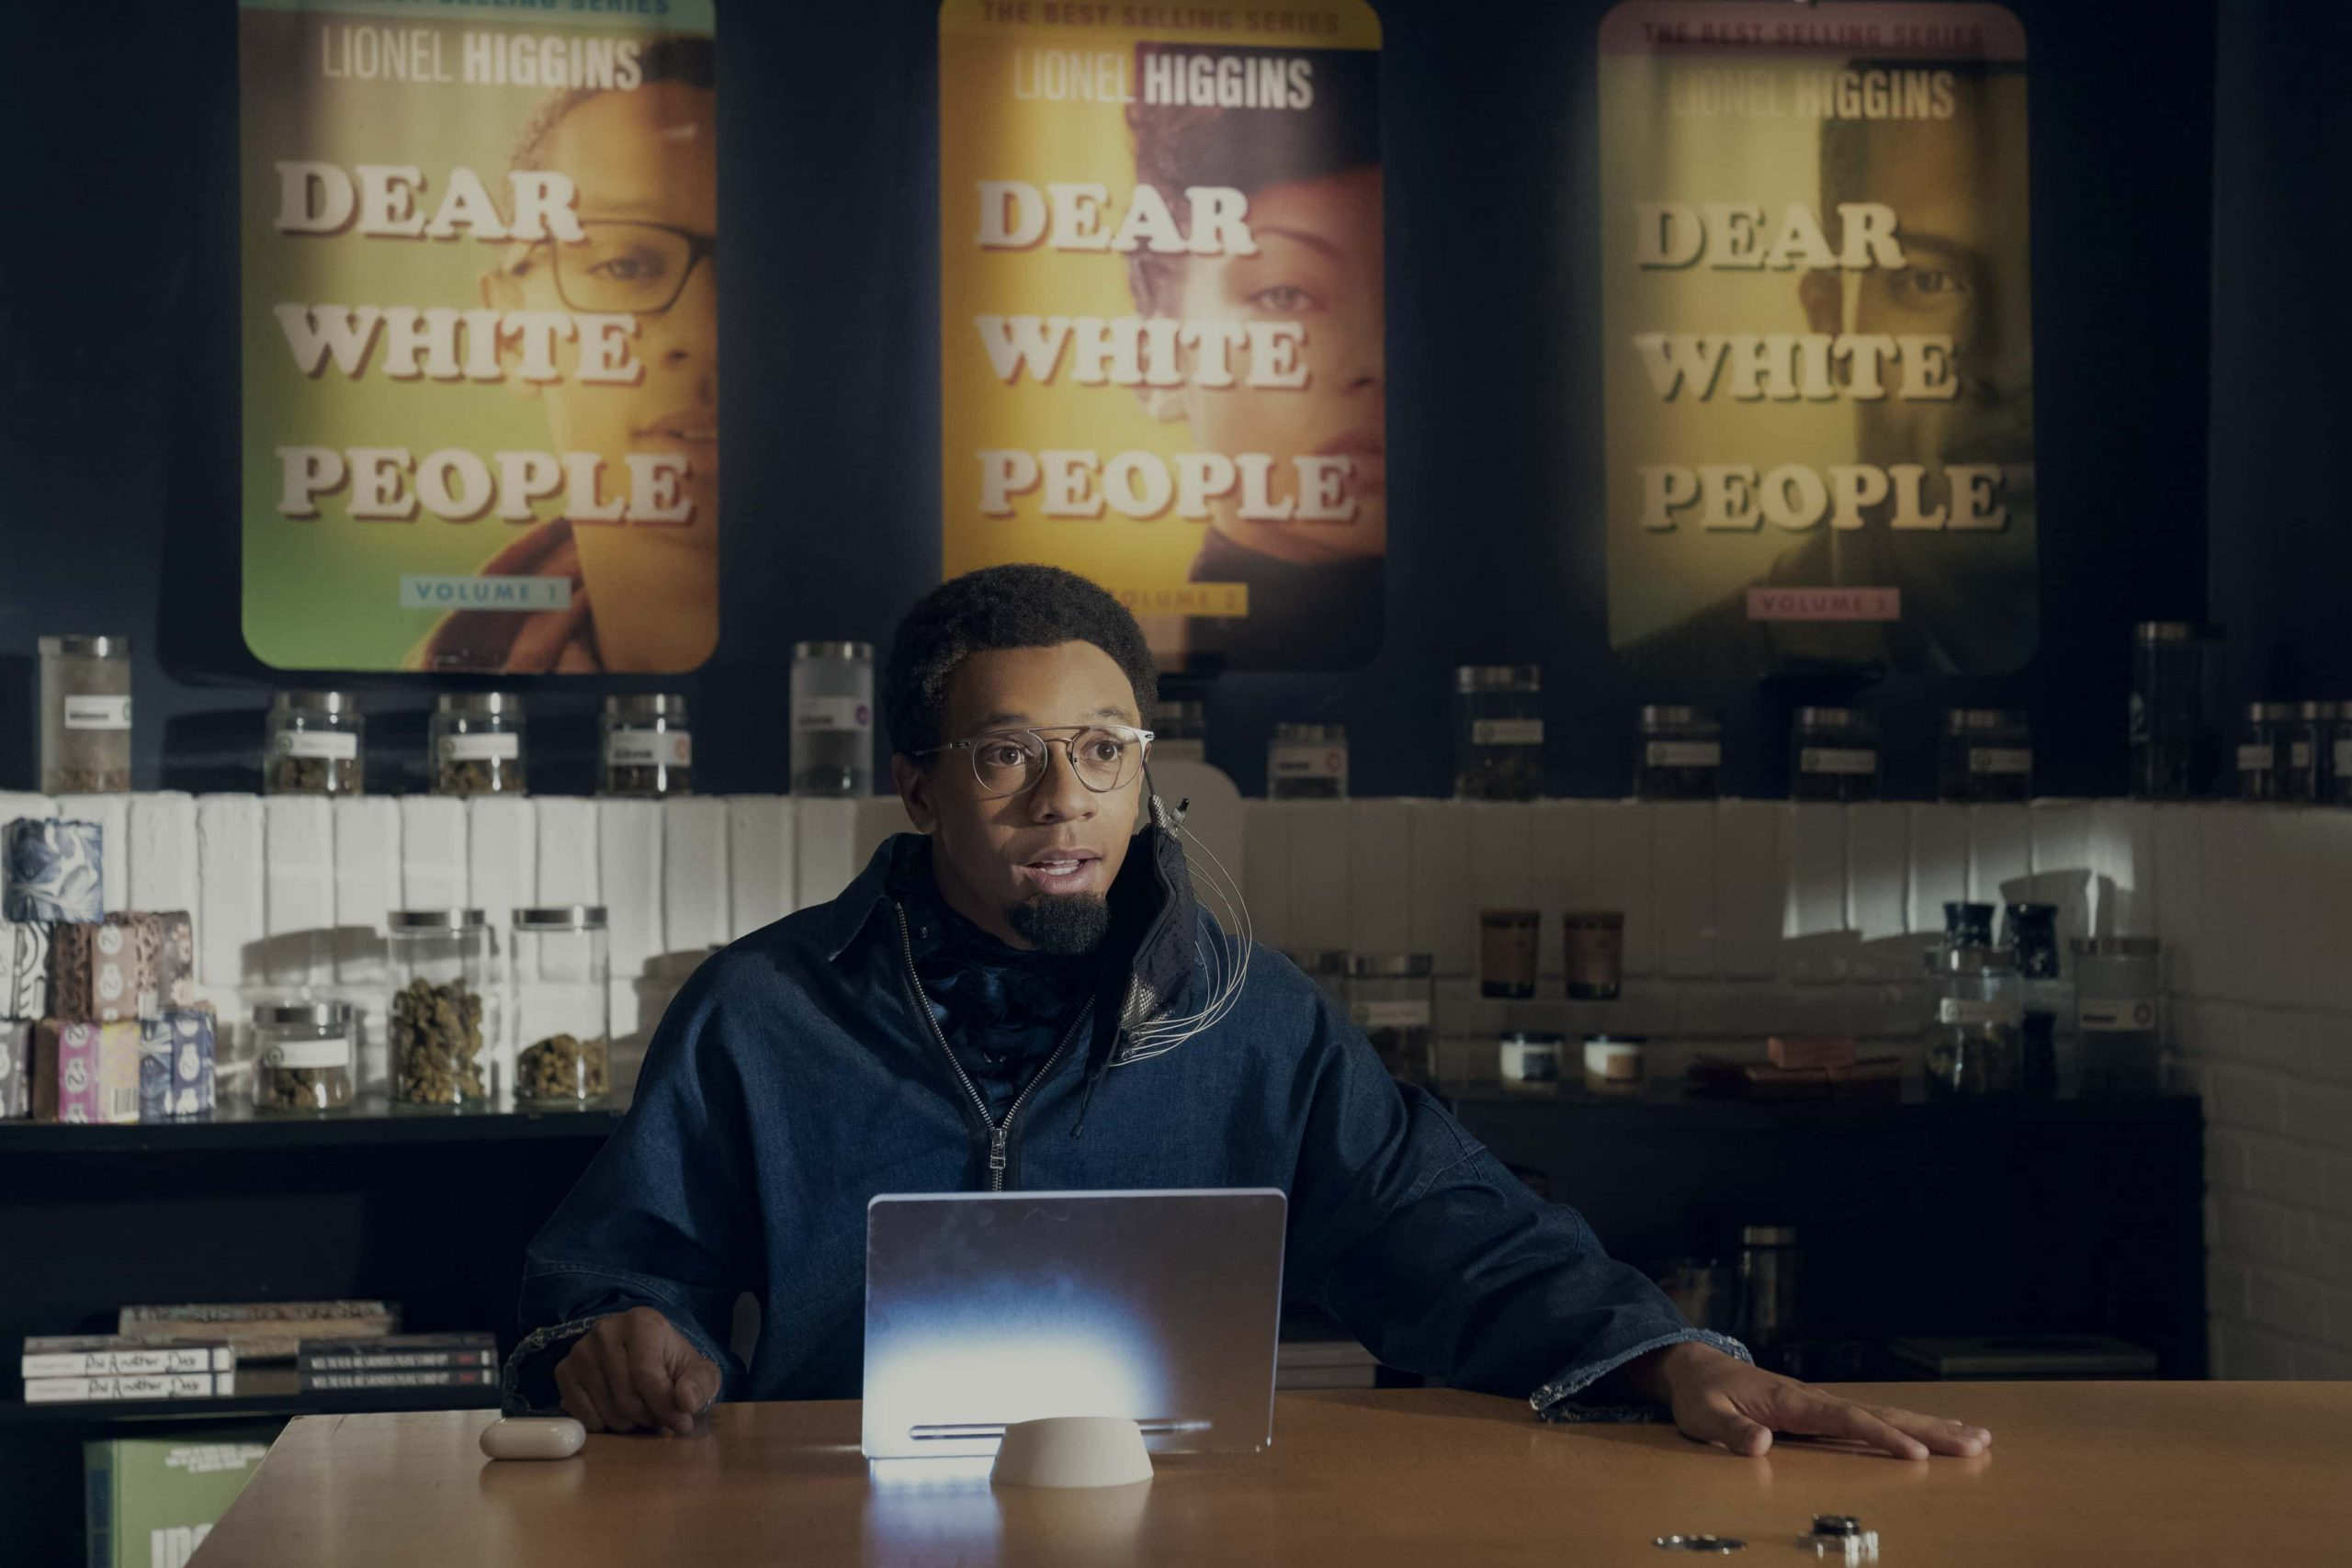 Dear White People sezon 4 recenzja opinie